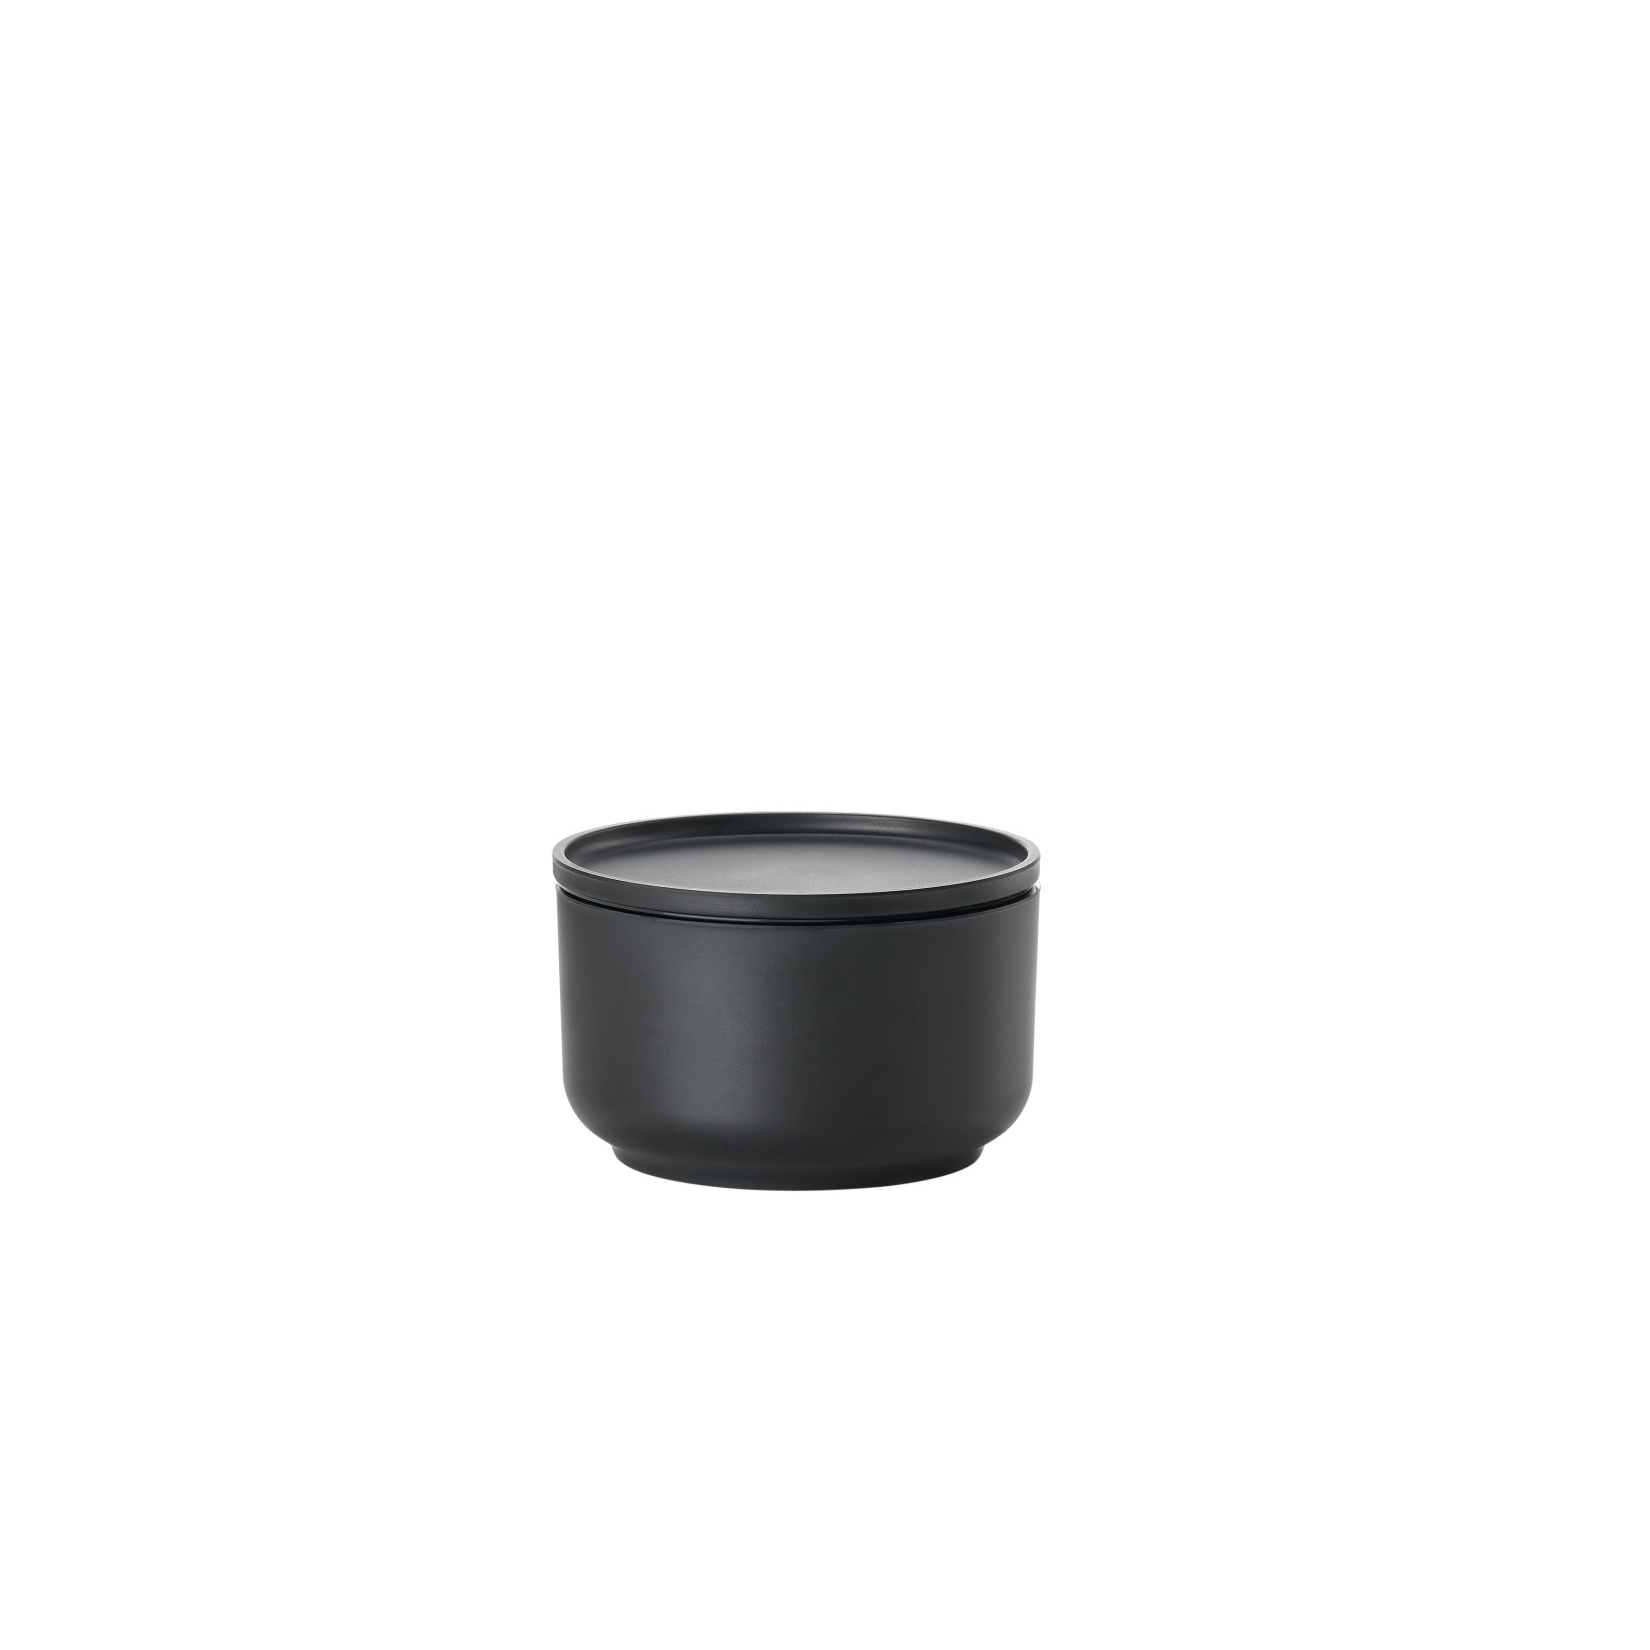 Servírovací mísa 0,5 l, černá, Peili - Zone Denmark